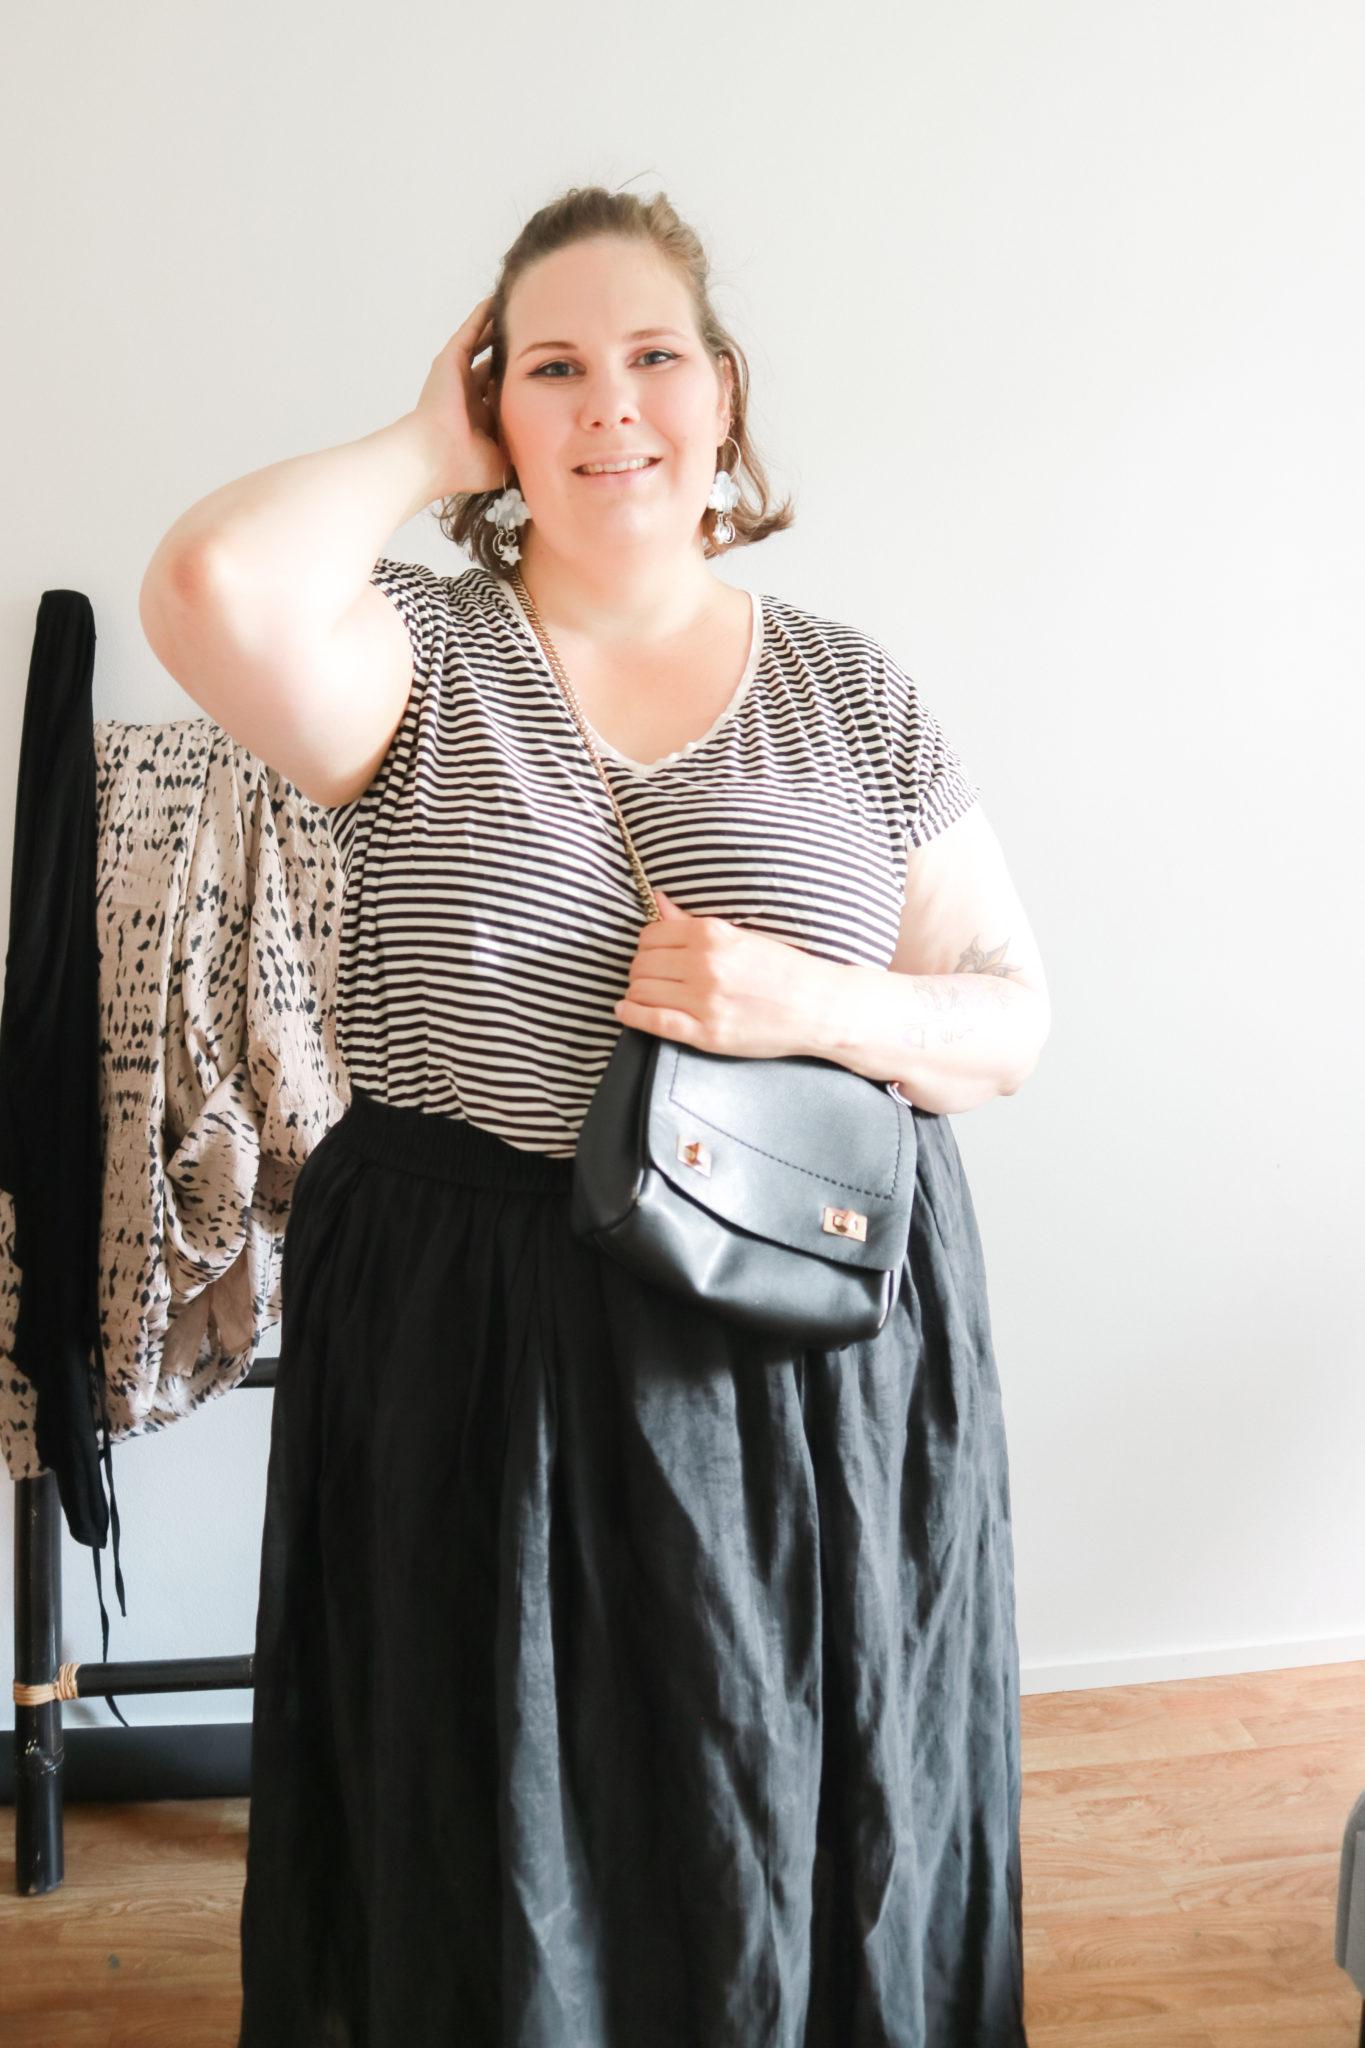 Rento raitapaita ja hame - Pluskokoisten muoti - BMH  - Big mamas home by Jenni